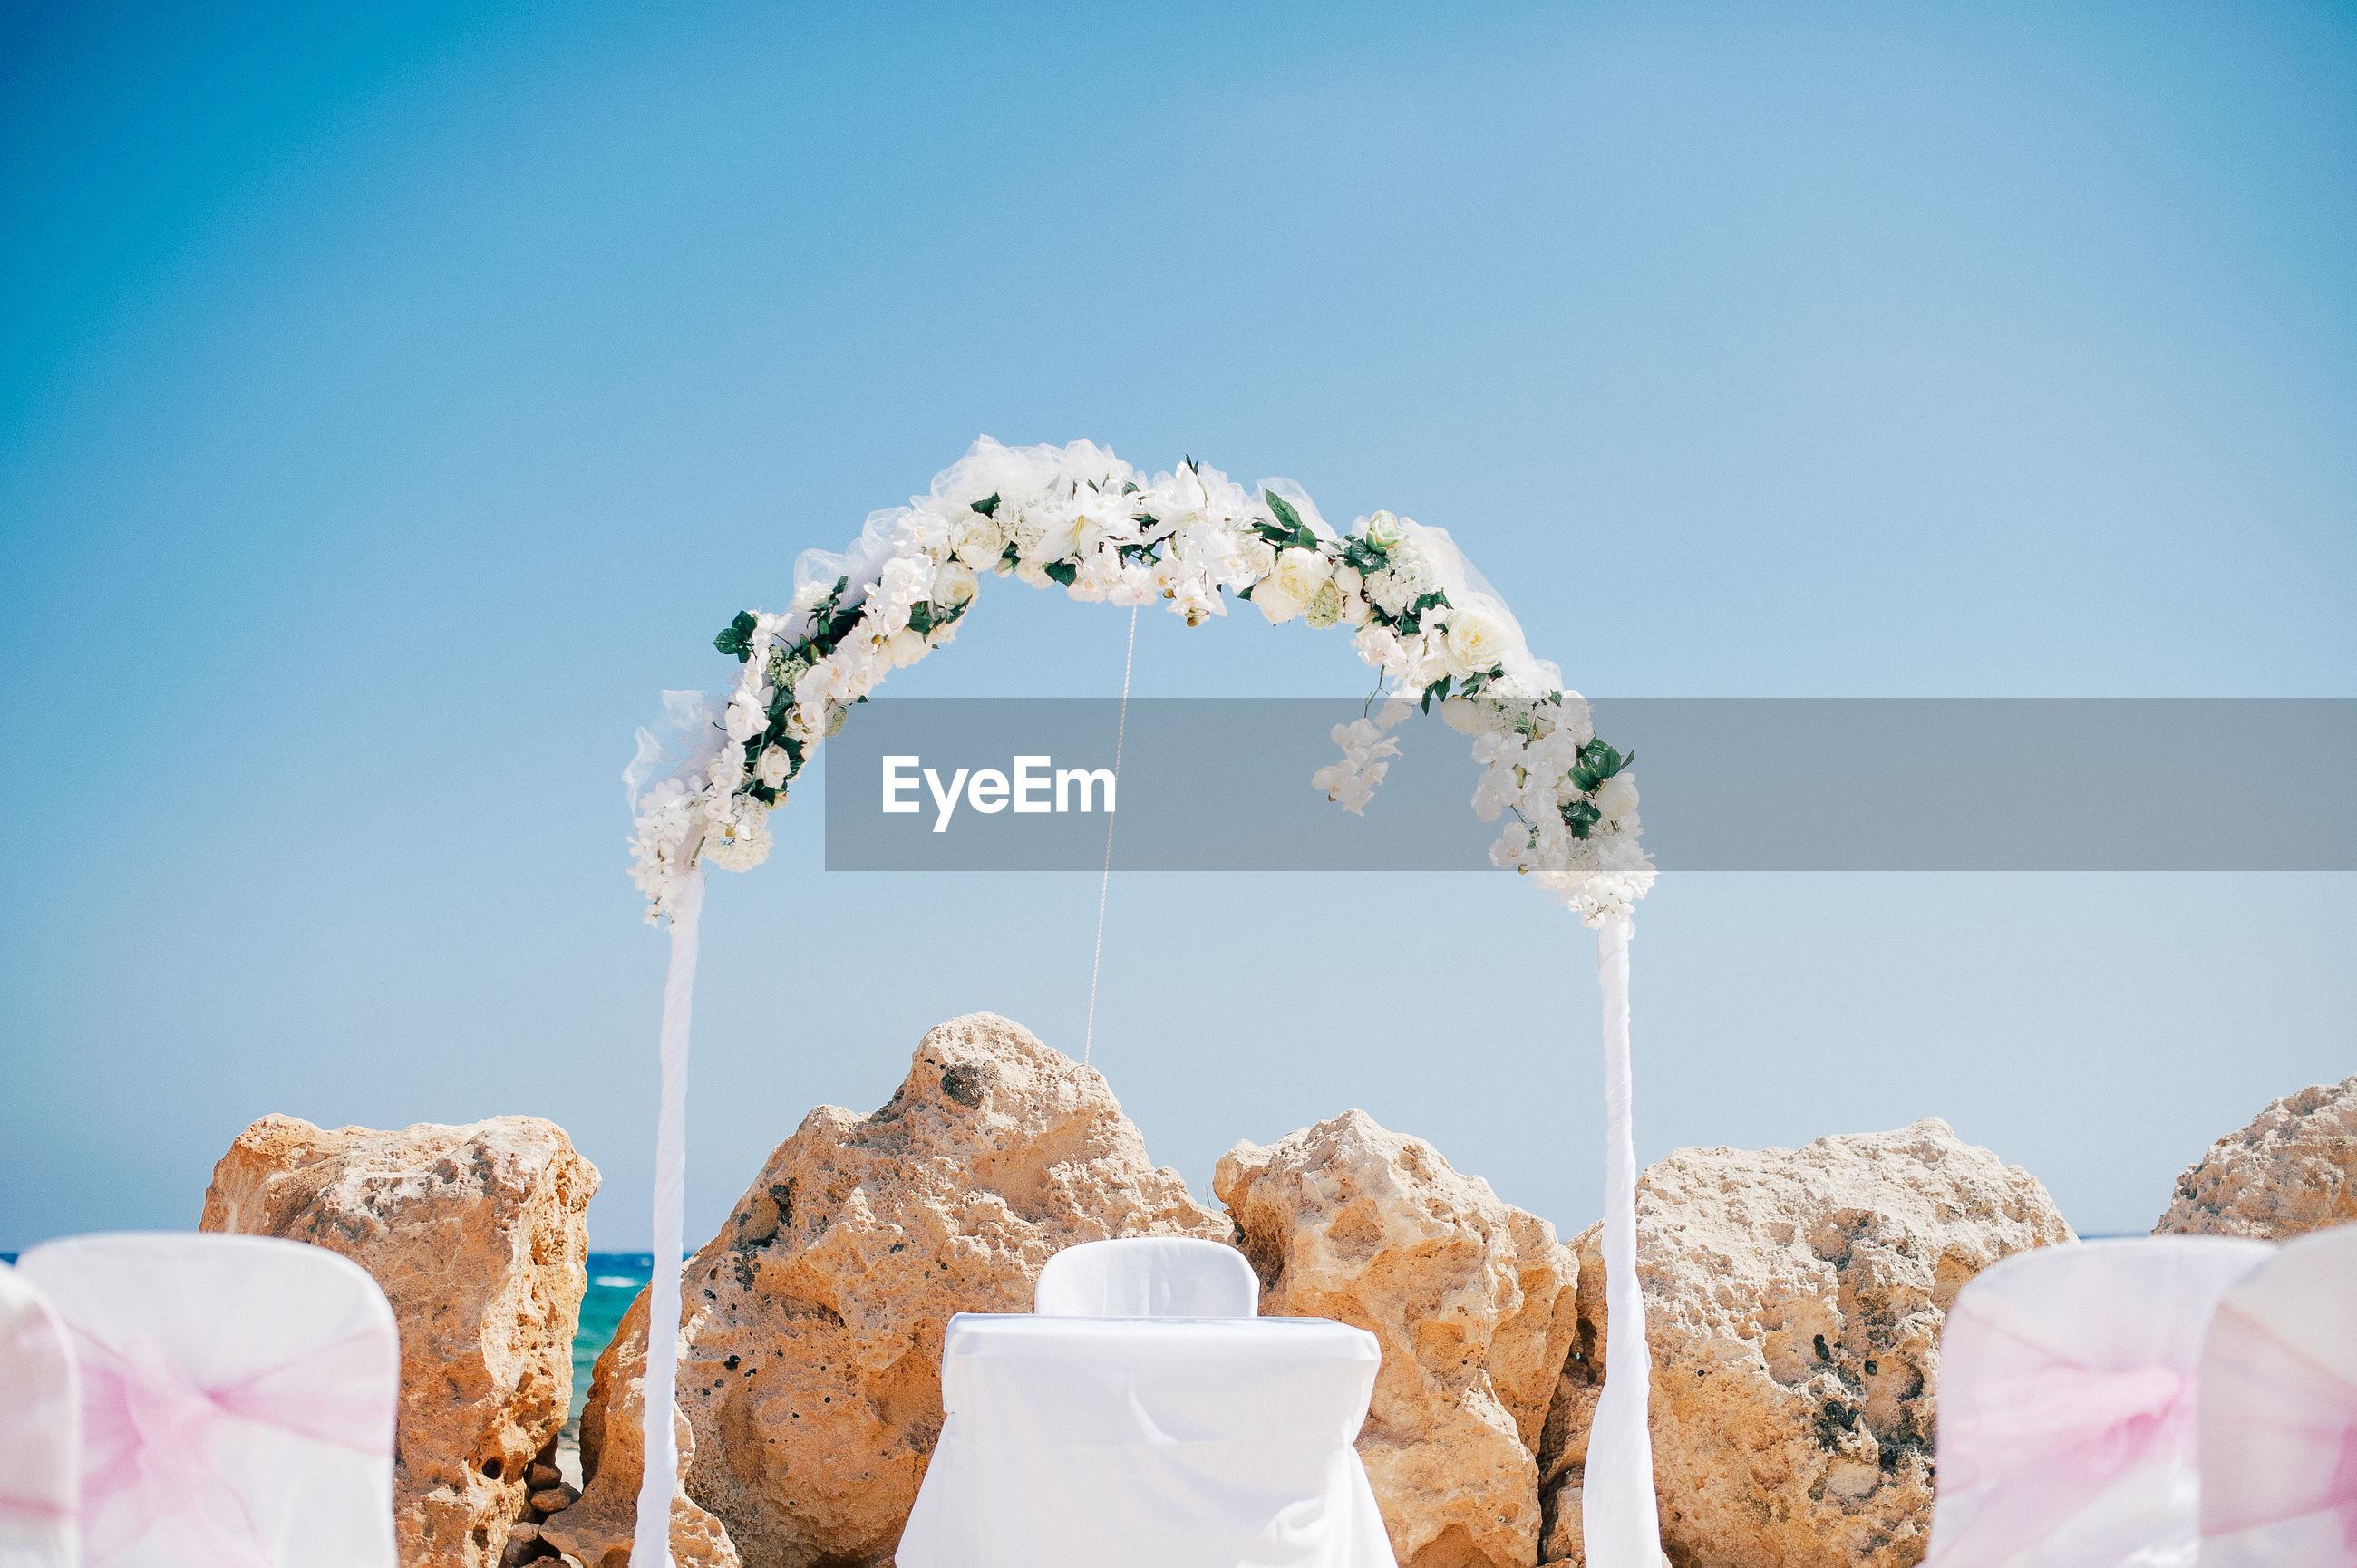 Wedding decoration by rocks at beach